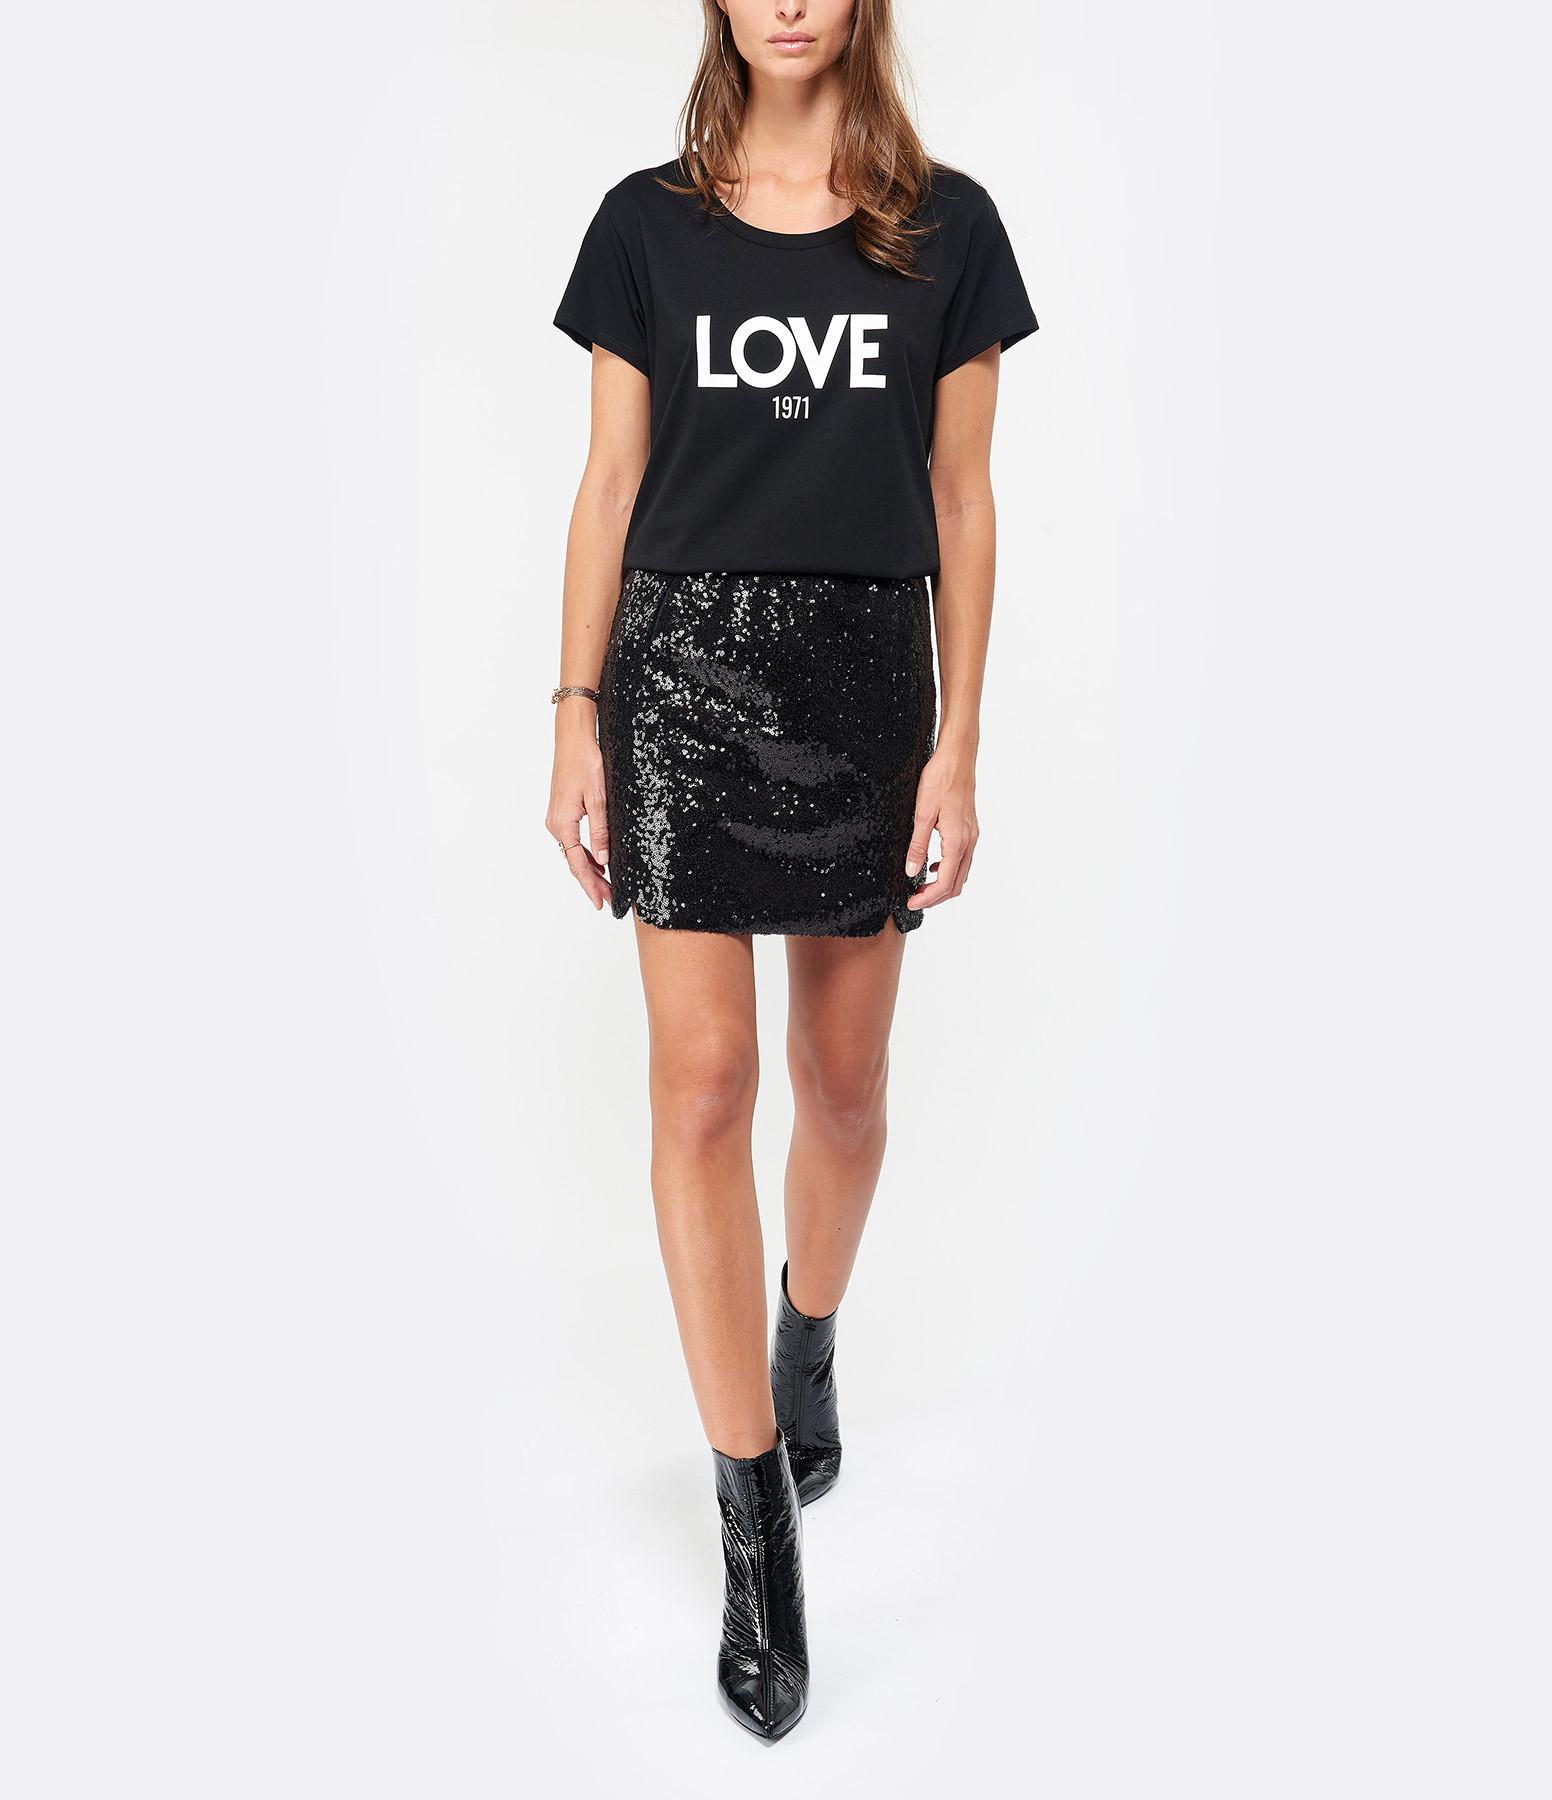 JEANNE VOULAND - Tee-shirt Ben Love 1971 Noir Imprimé Blanc